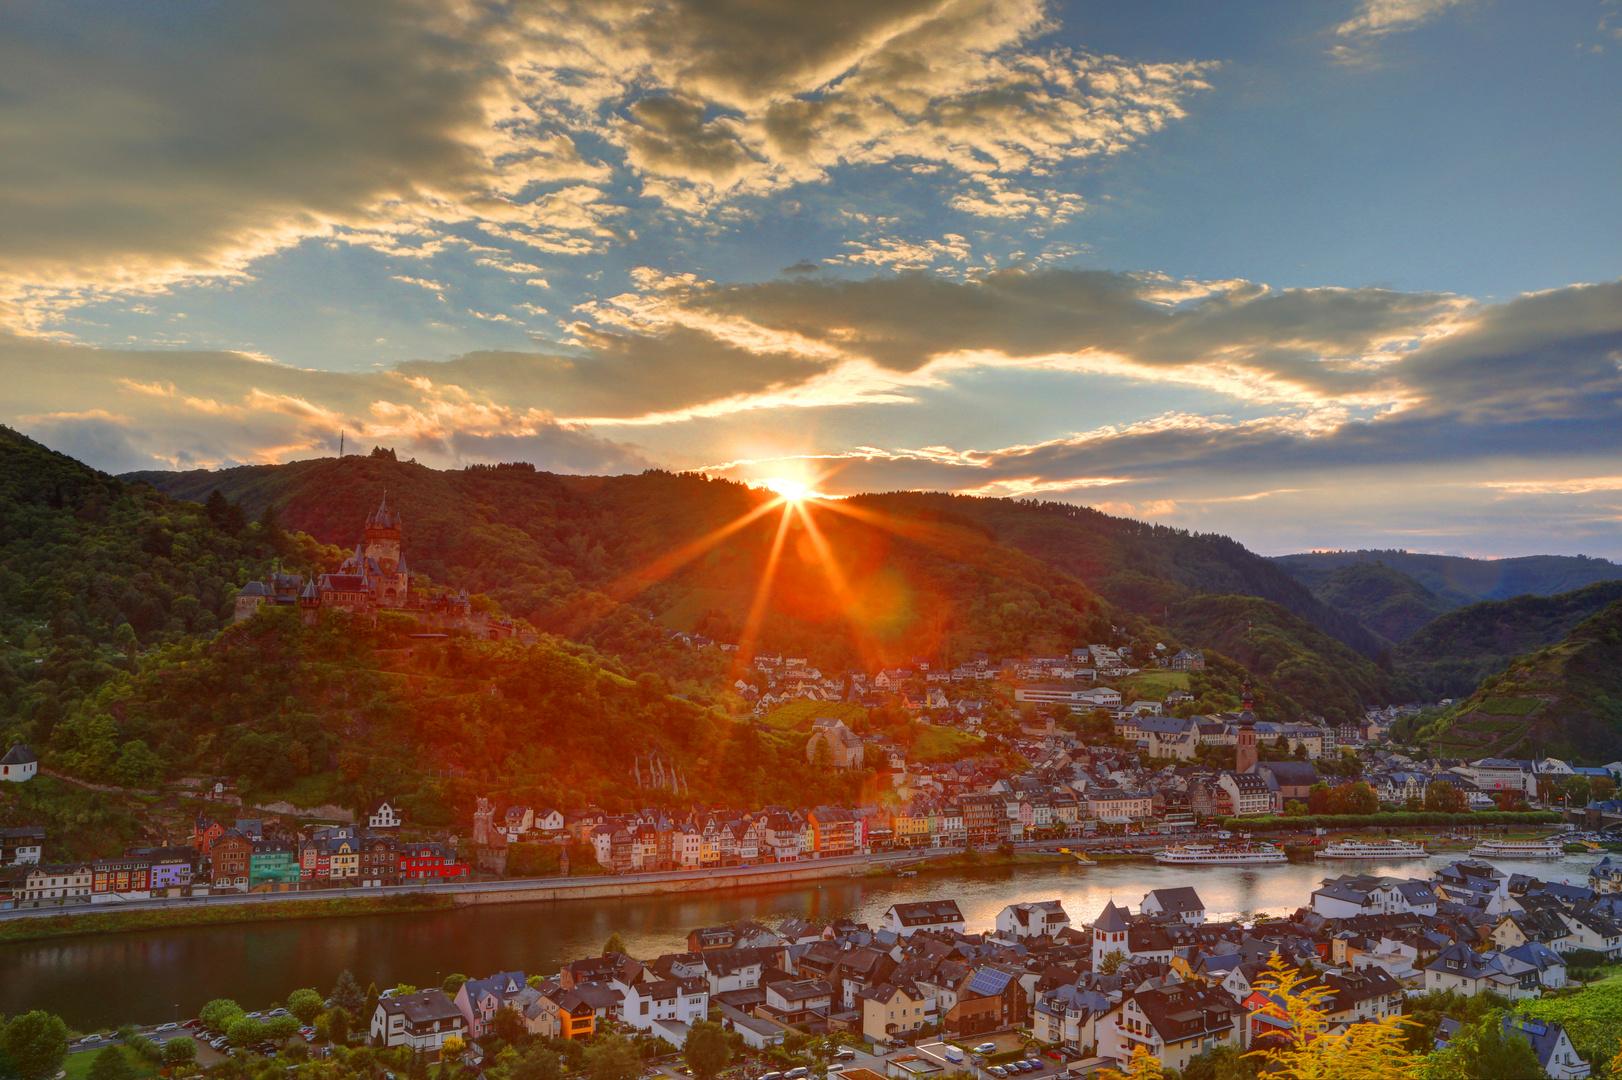 Sonnenuntergang in Cochem